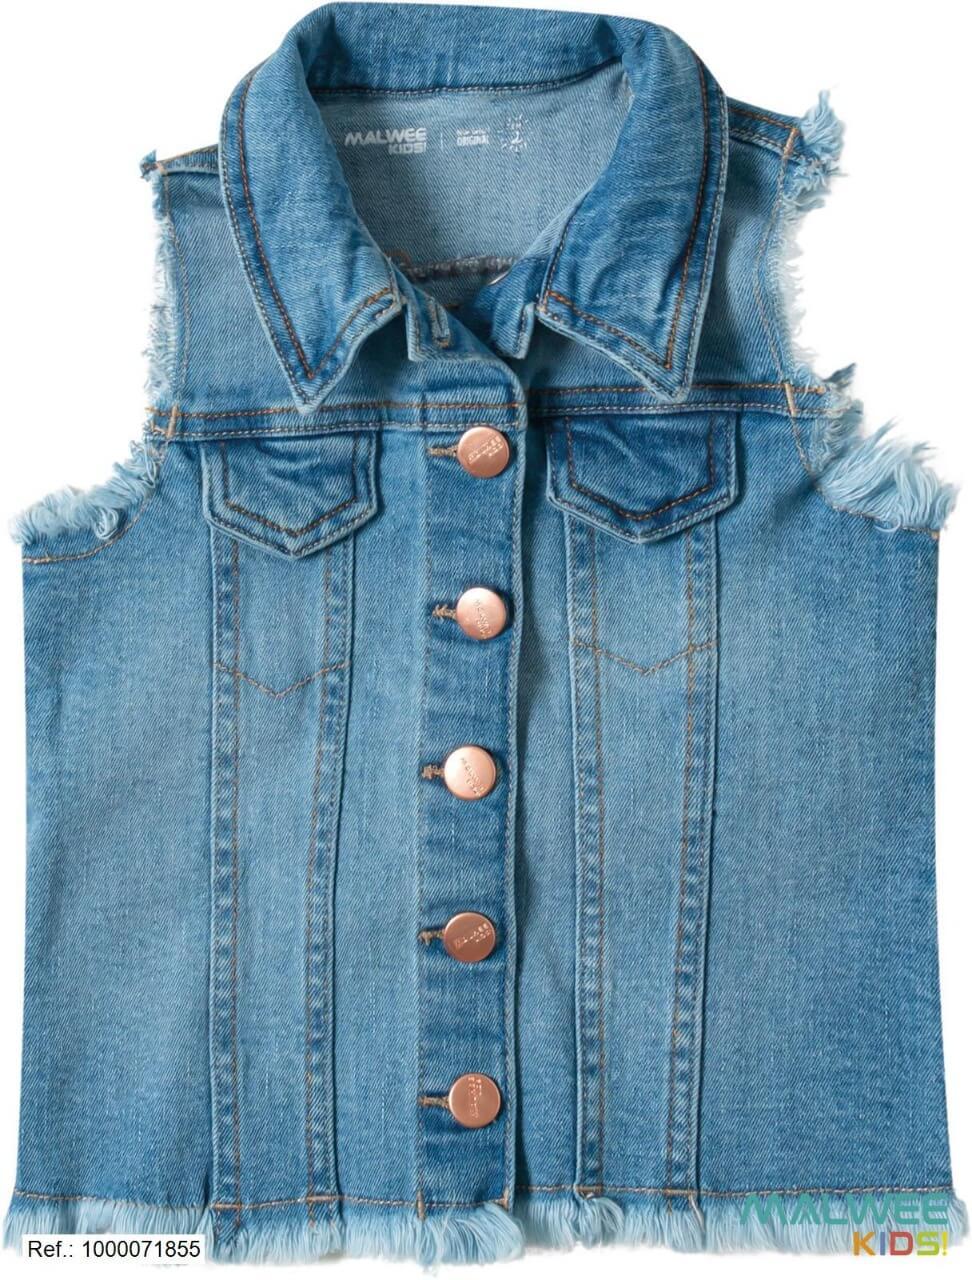 Colete Jeans Malwee